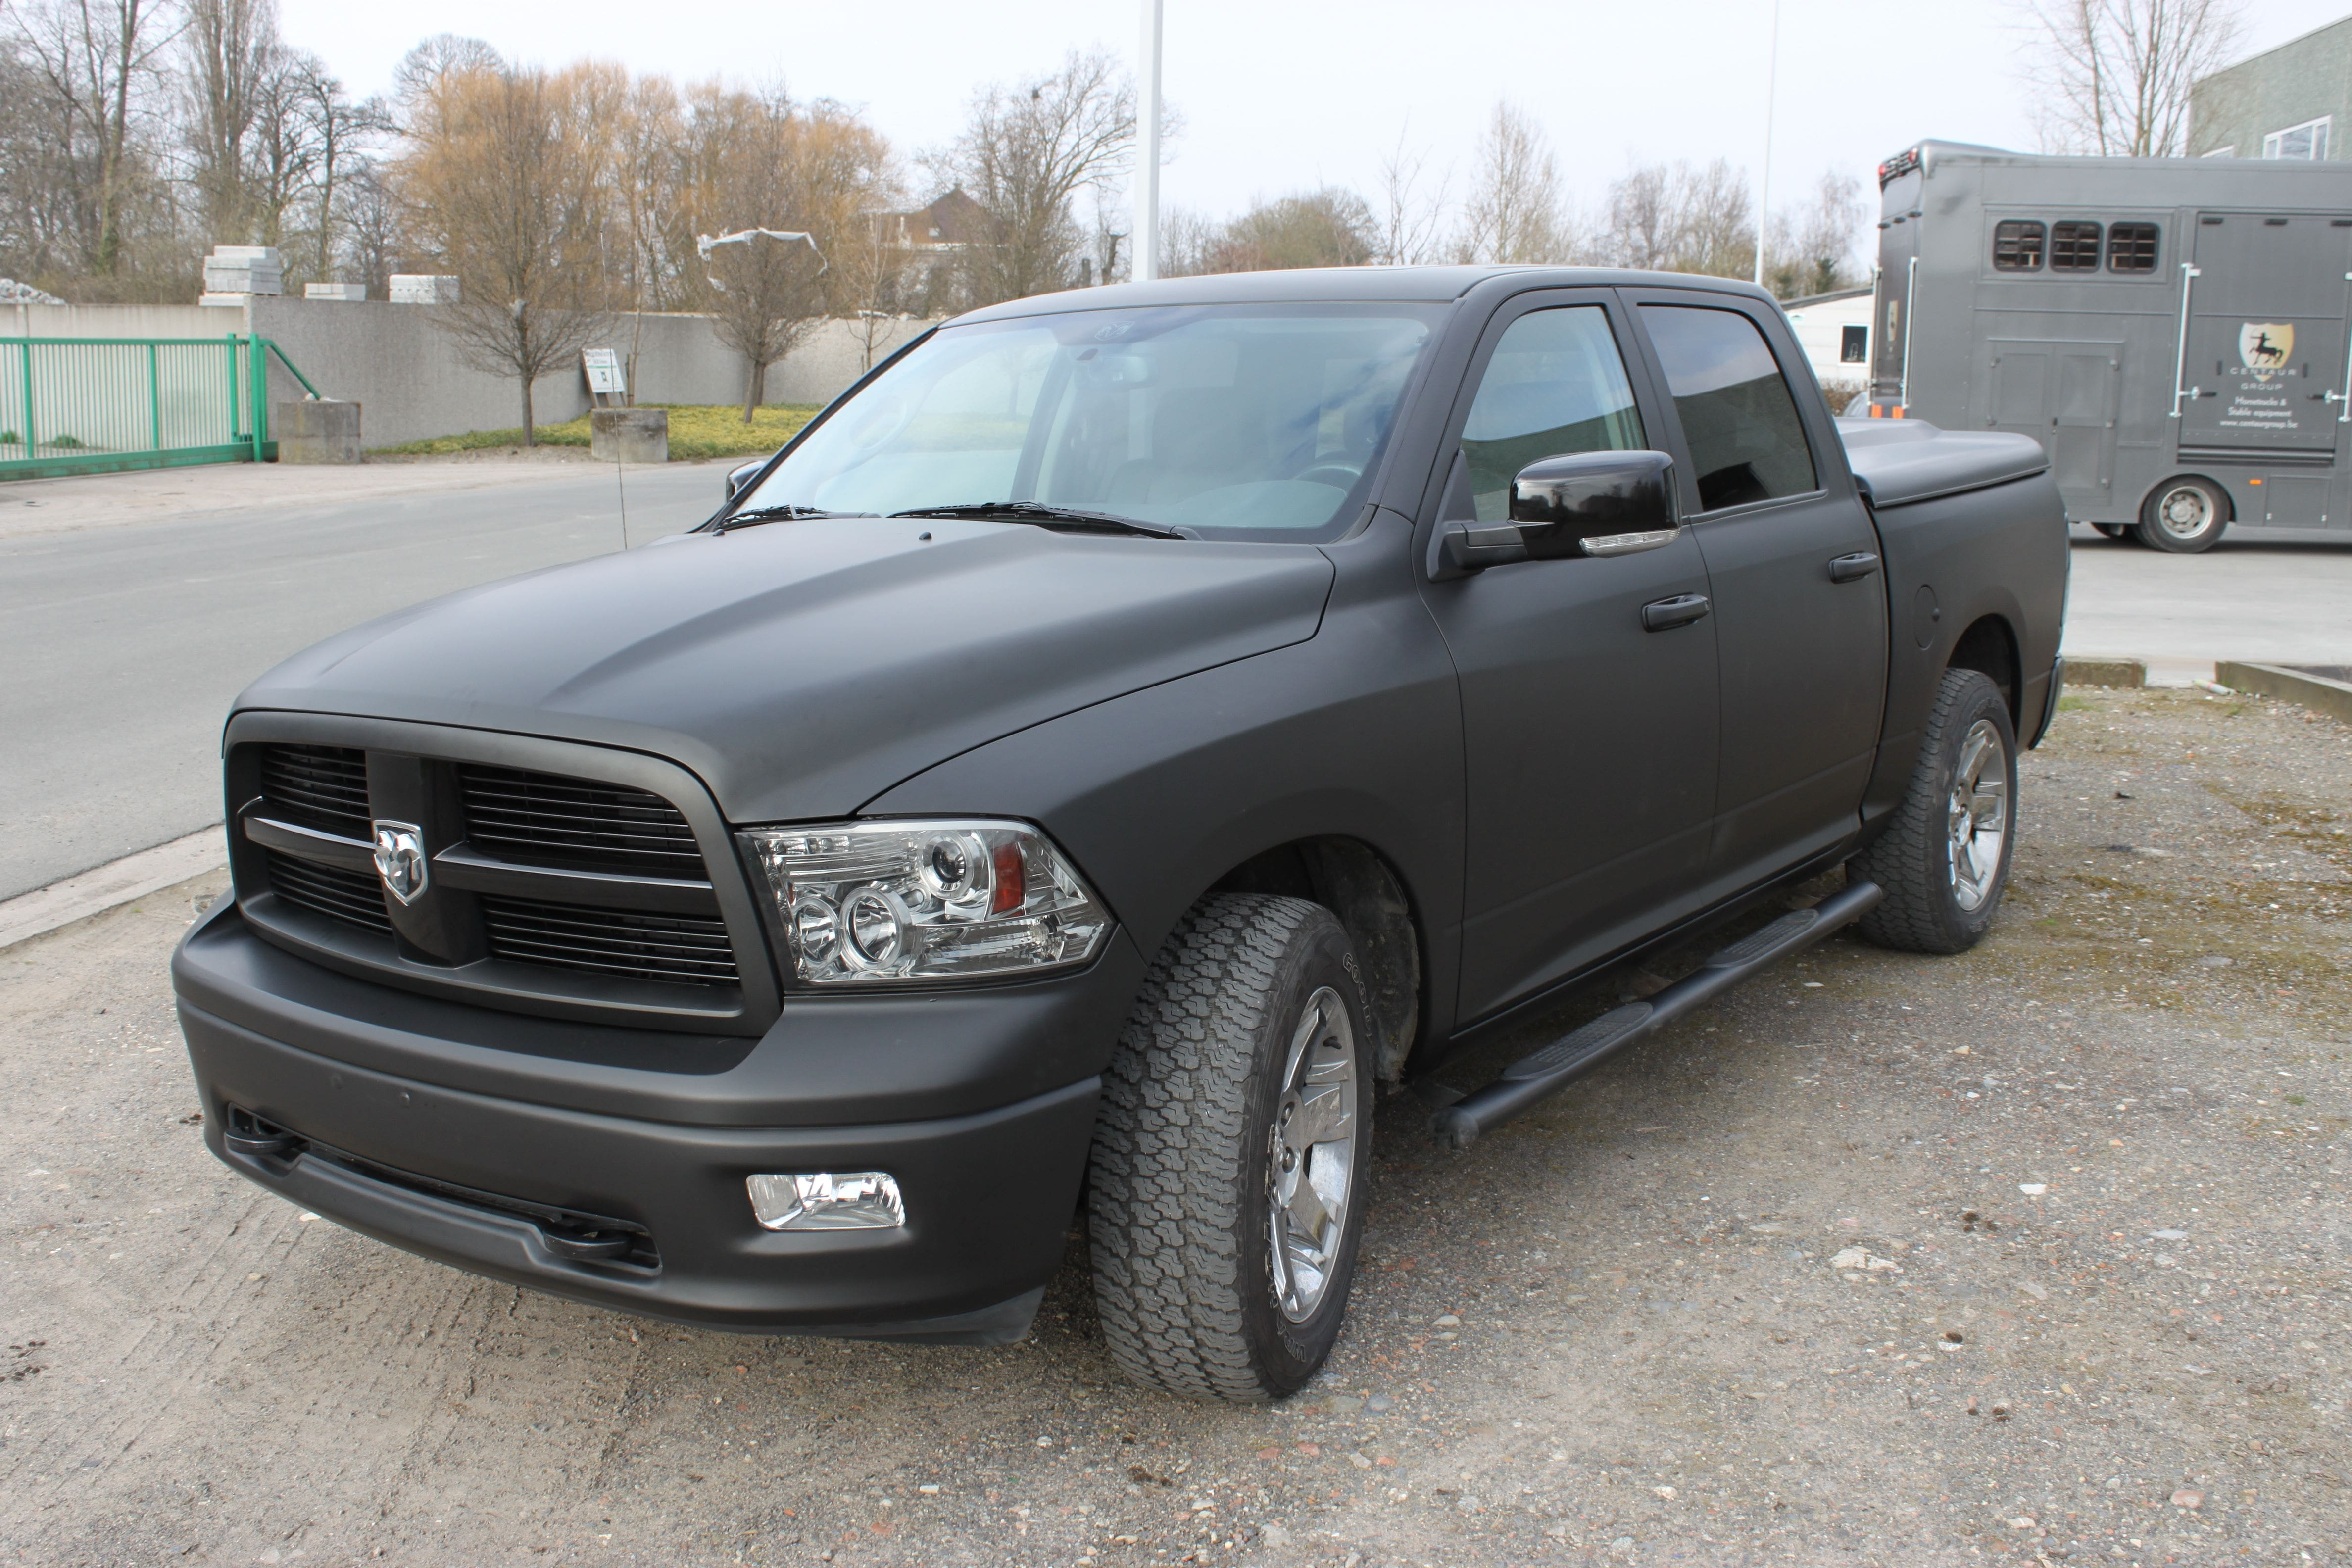 Dodge Ram met Mat Zwarte Wrap, Carwrapping door Wrapmyride.nu Foto-nr:5679, ©2020